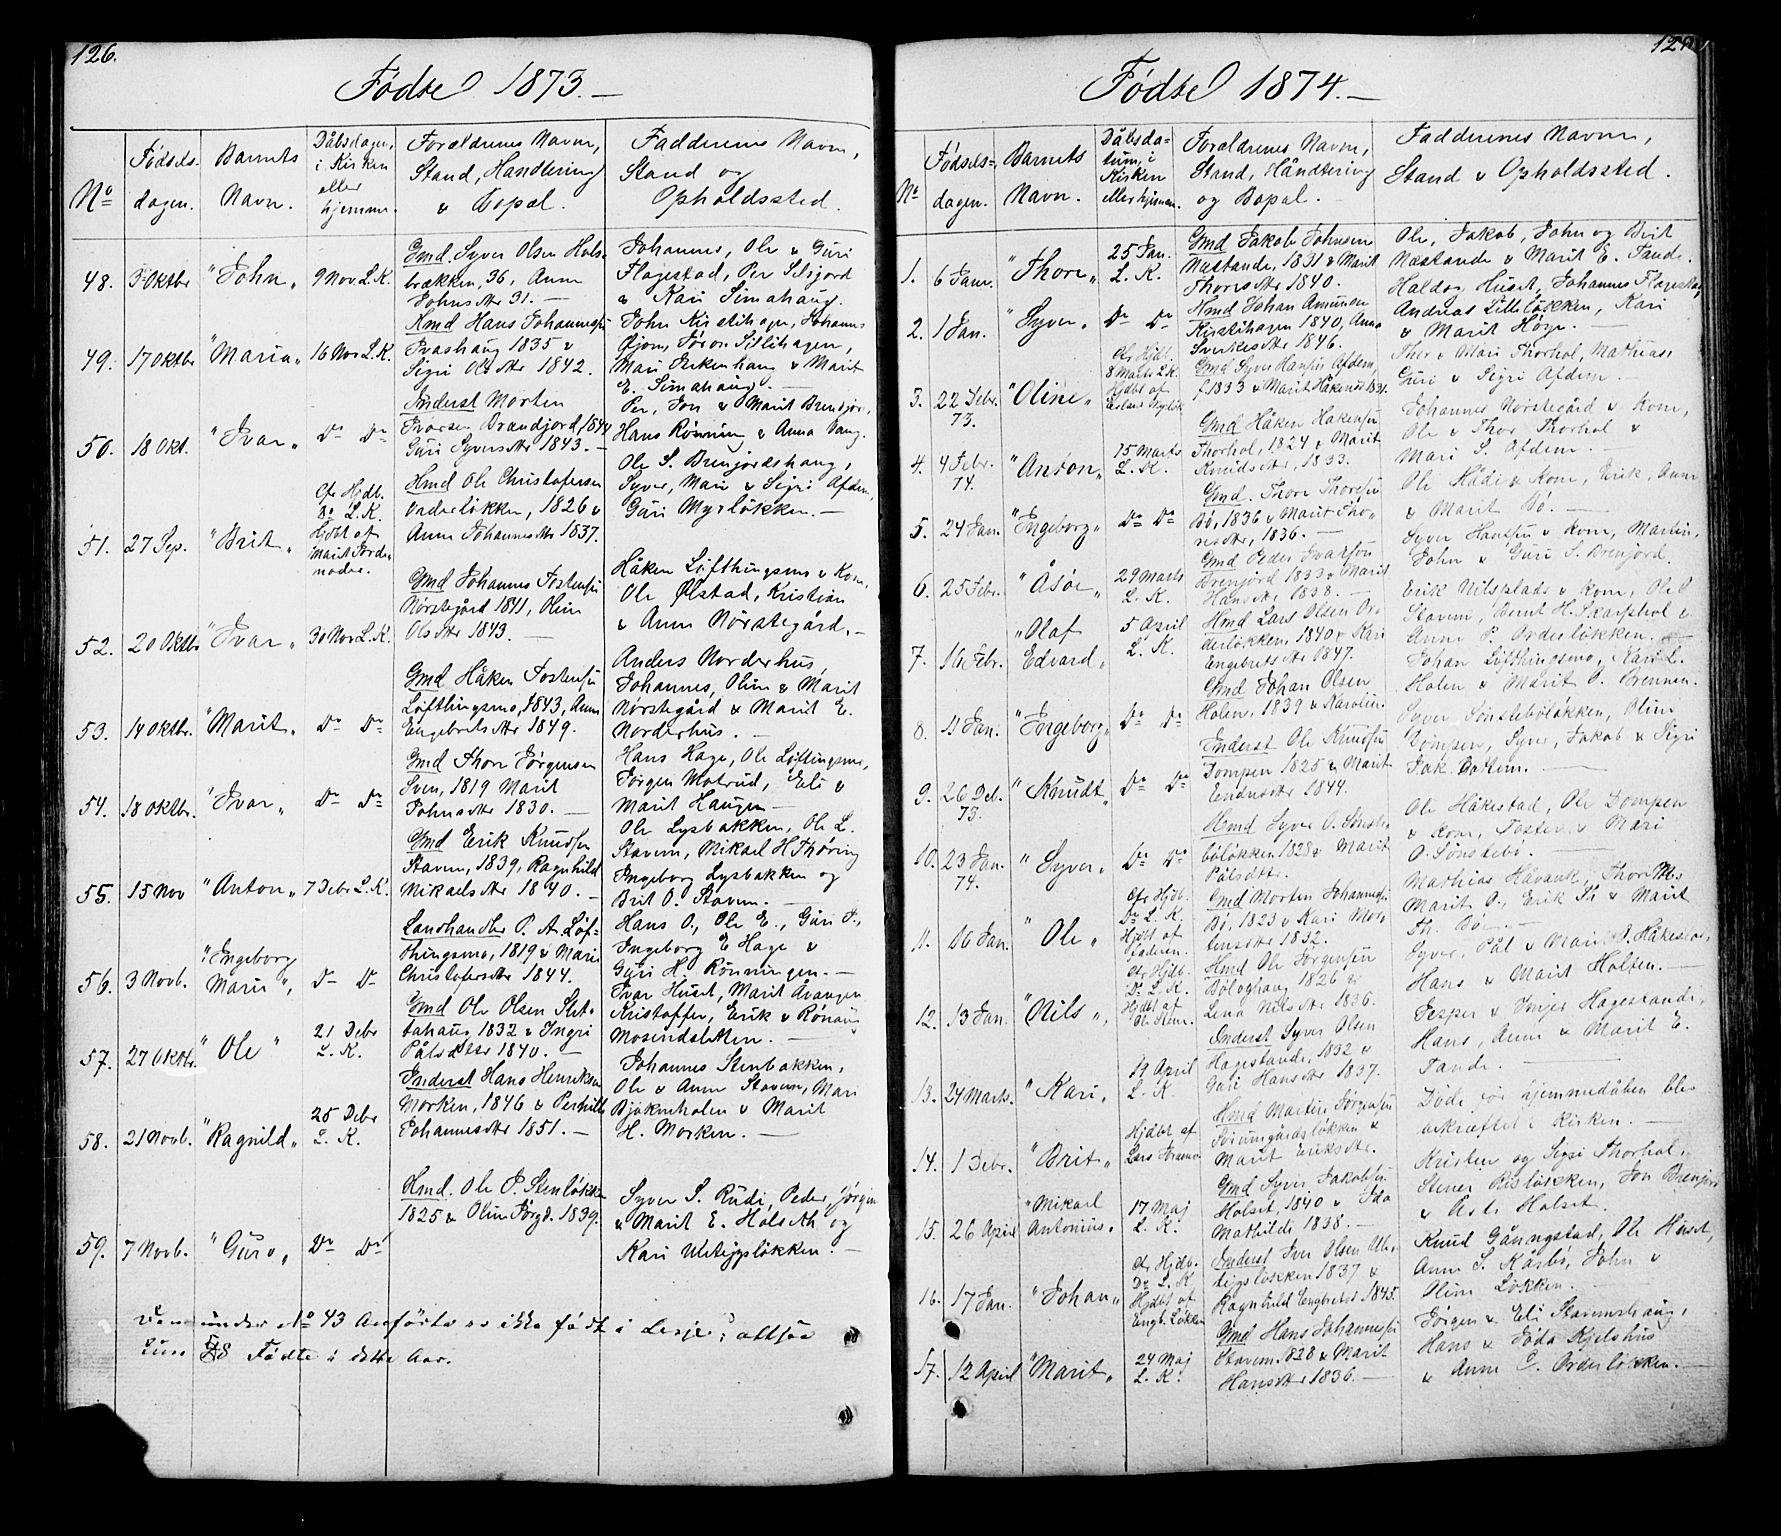 SAH, Lesja prestekontor, Klokkerbok nr. 5, 1850-1894, s. 126-127